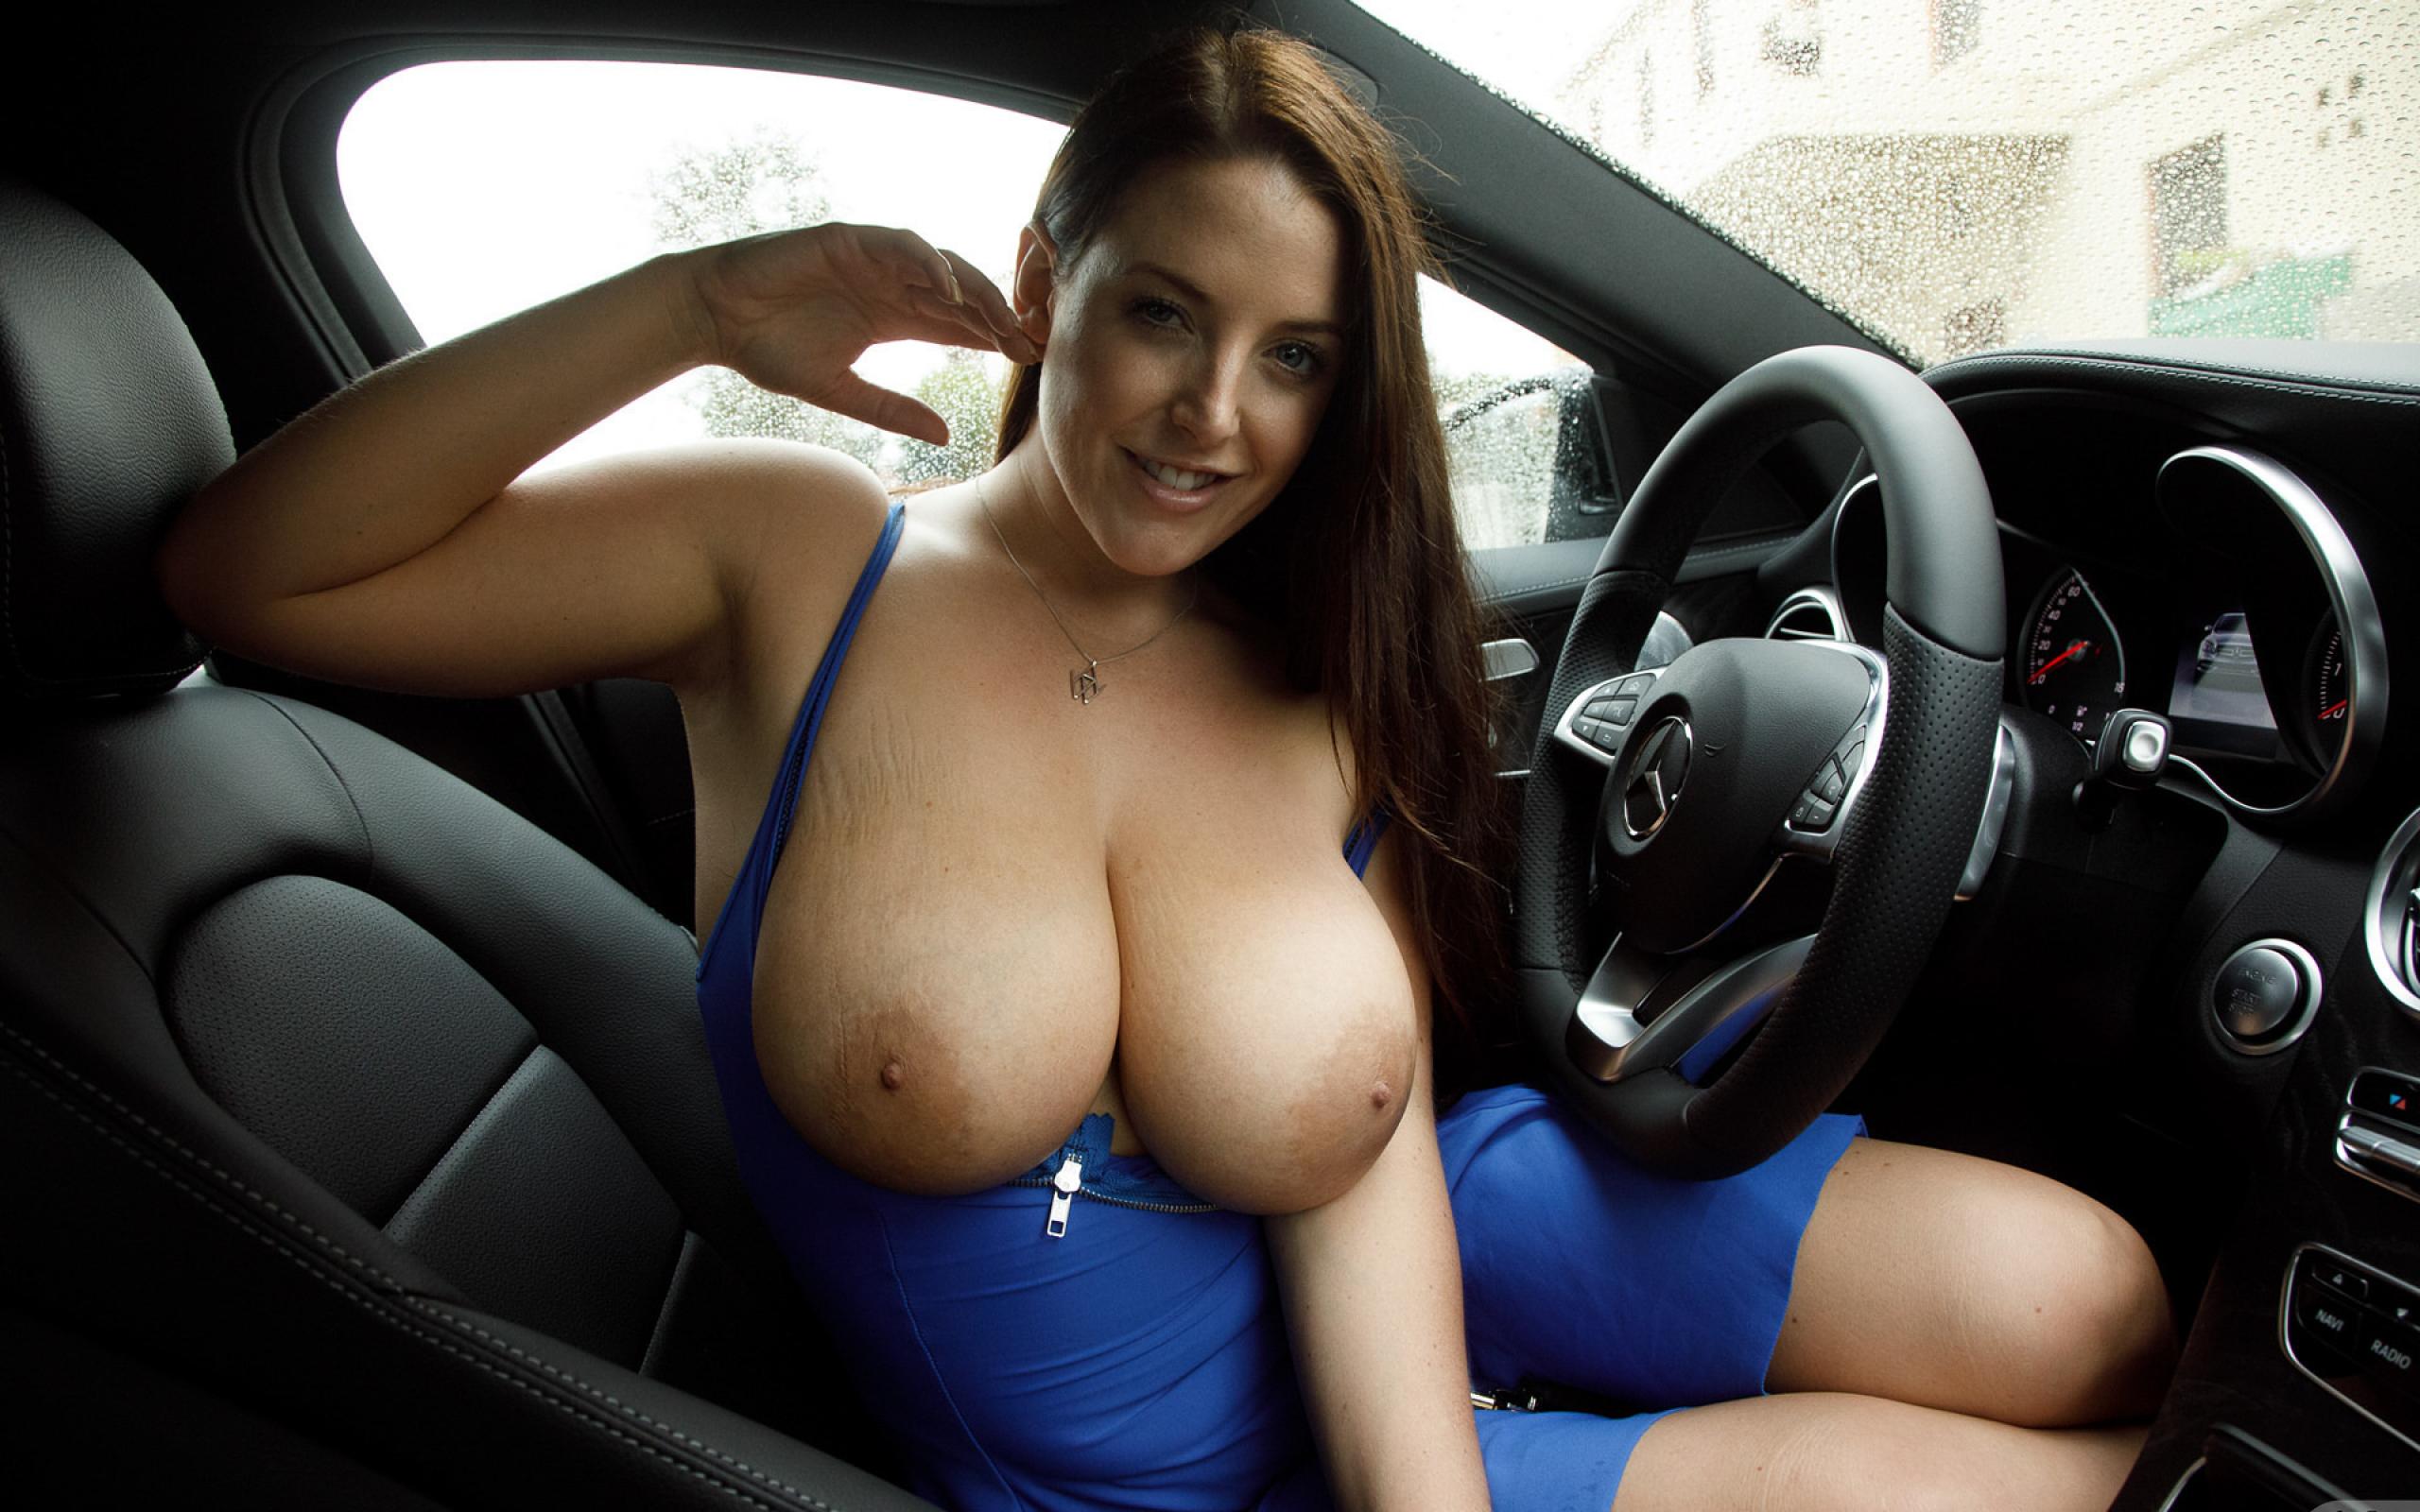 Boob car show, dancer pussy feet